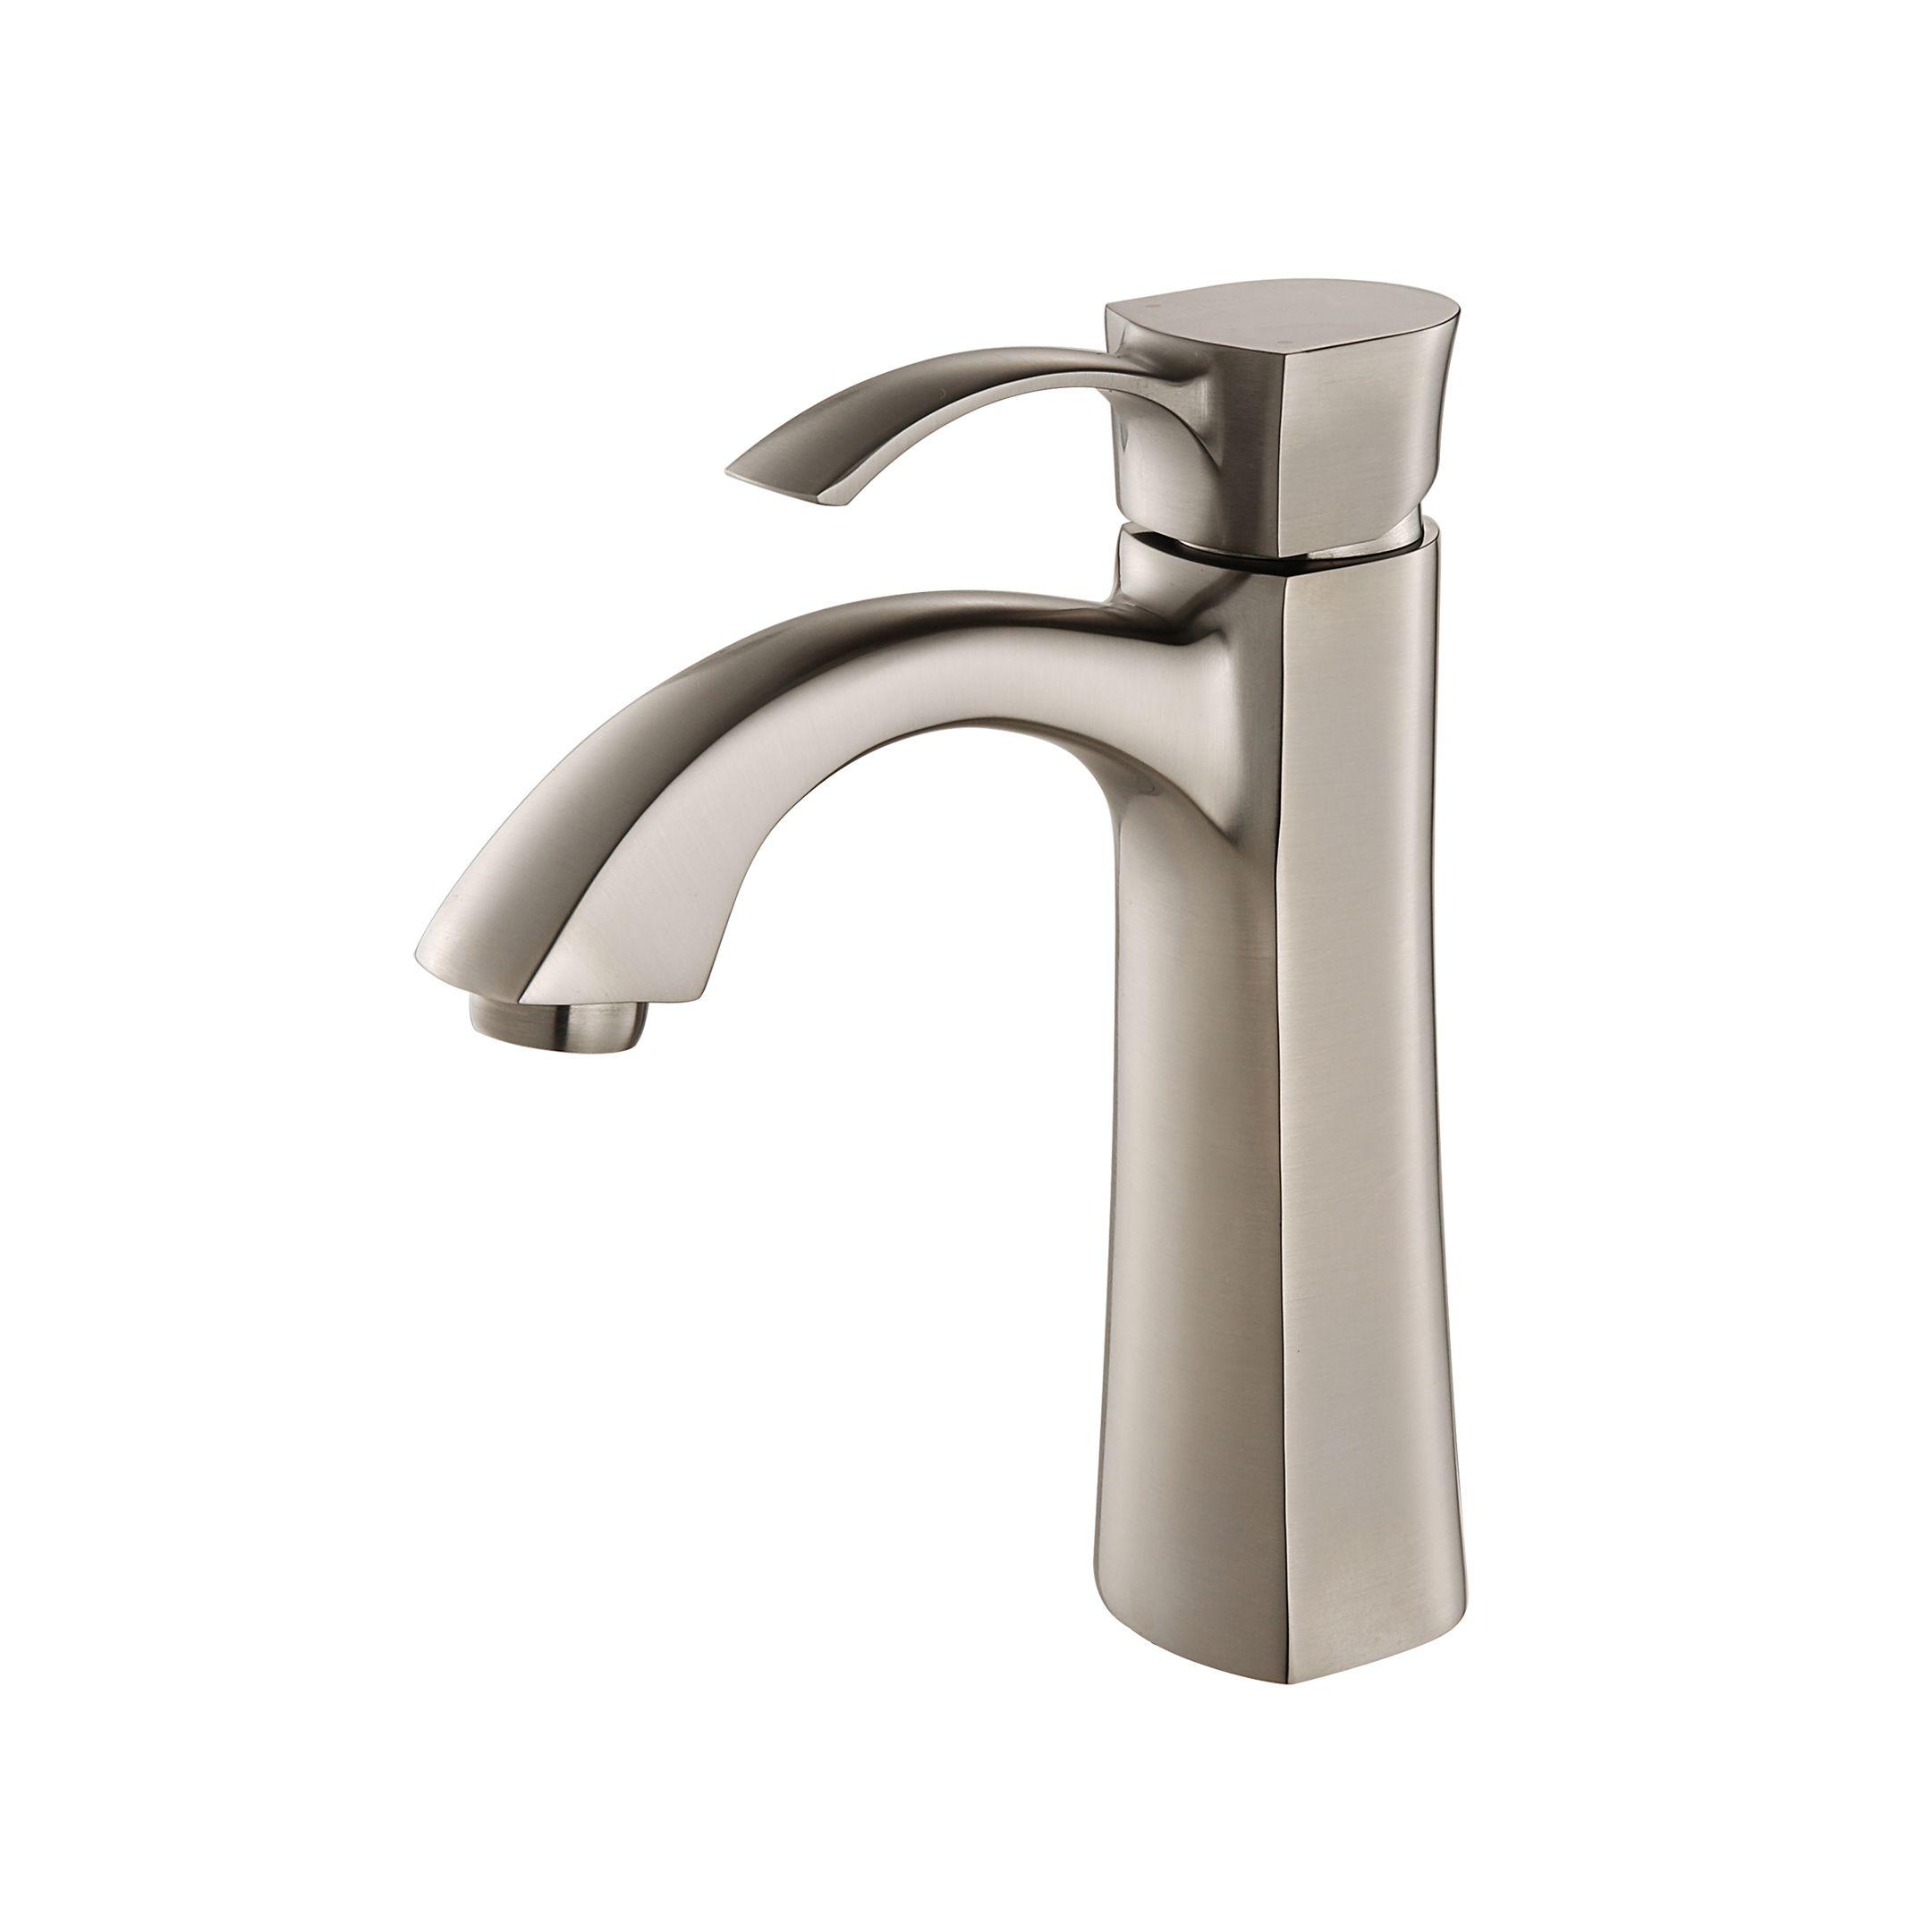 Bar 3740 Bn Single Handle Bar Faucet Bar Faucets Faucet Sink Faucets